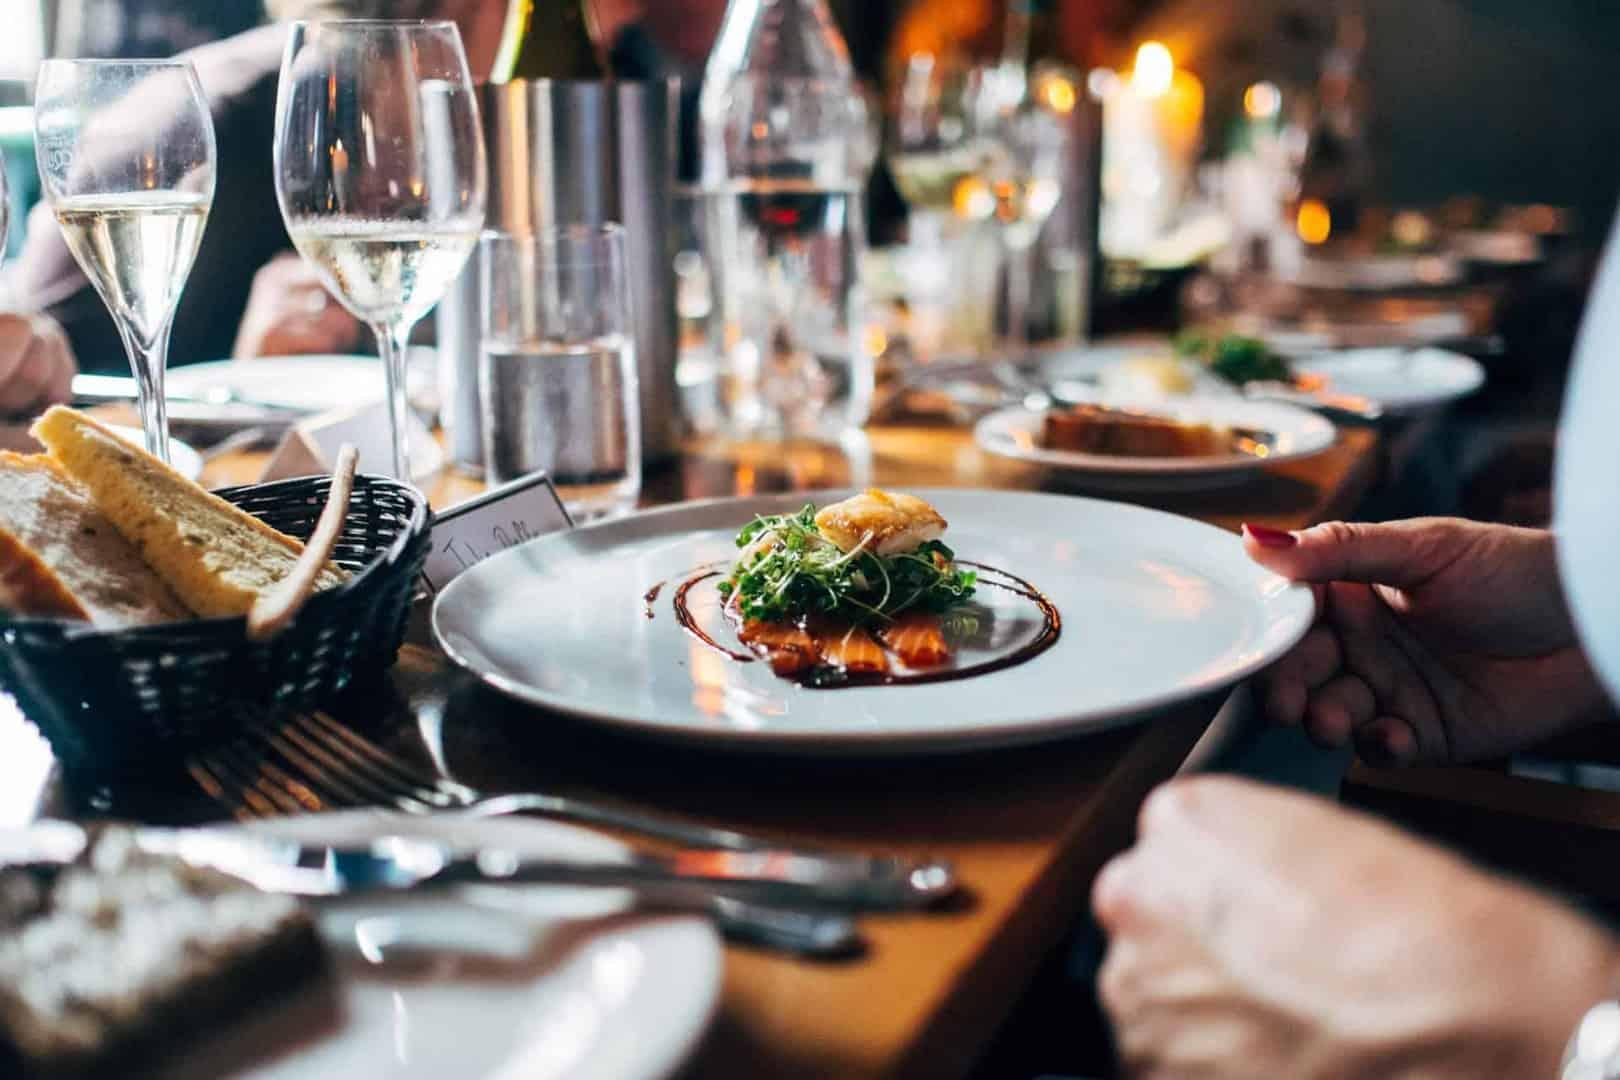 Food Safe Fly Spray For Restaurants